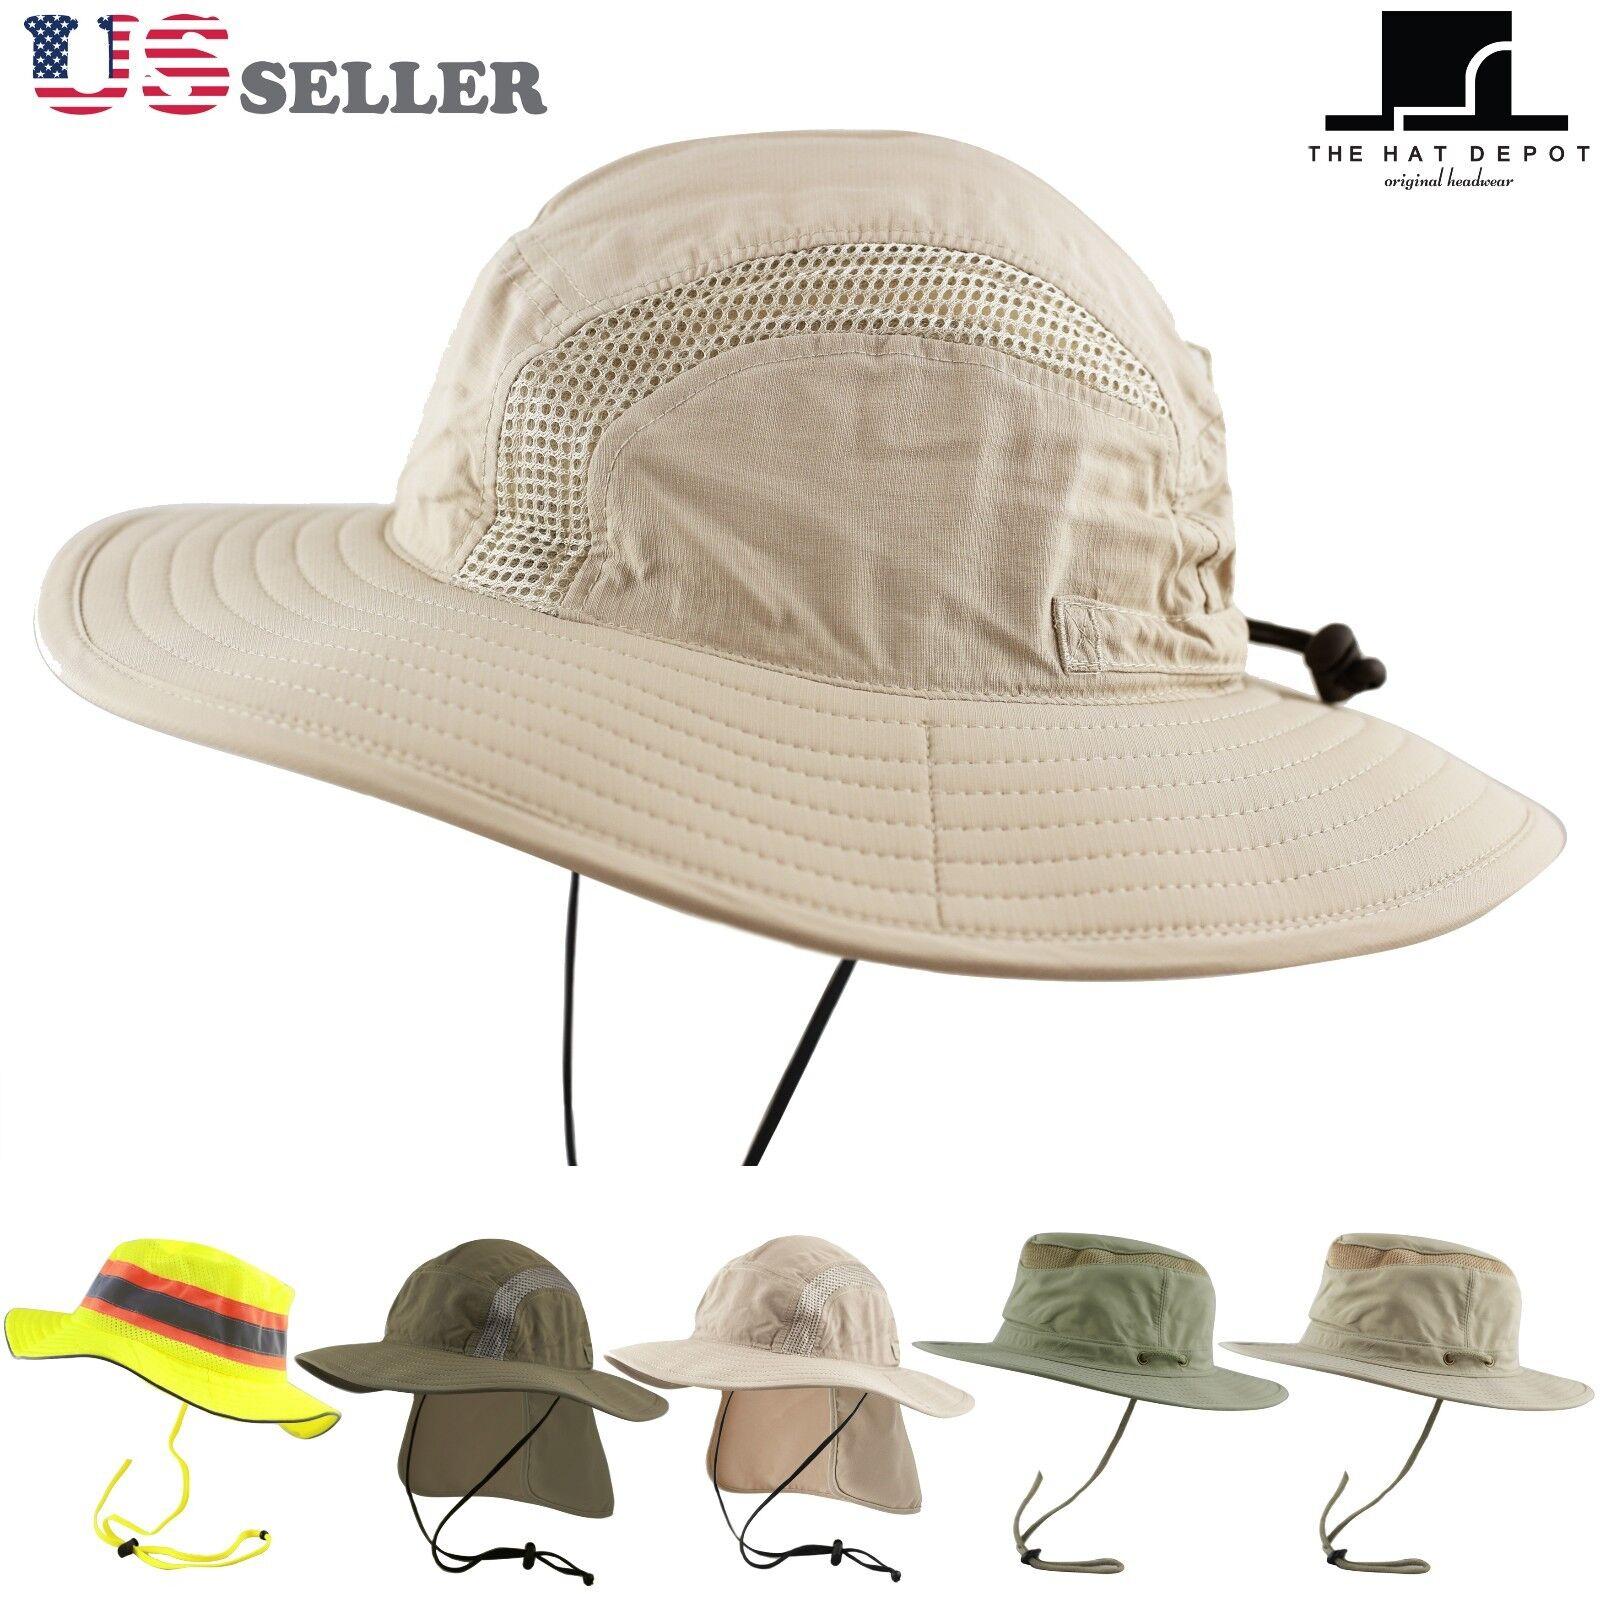 Bucket Hat - 50 UPF Sun Protection Outdoor Safari Sun Mesh B